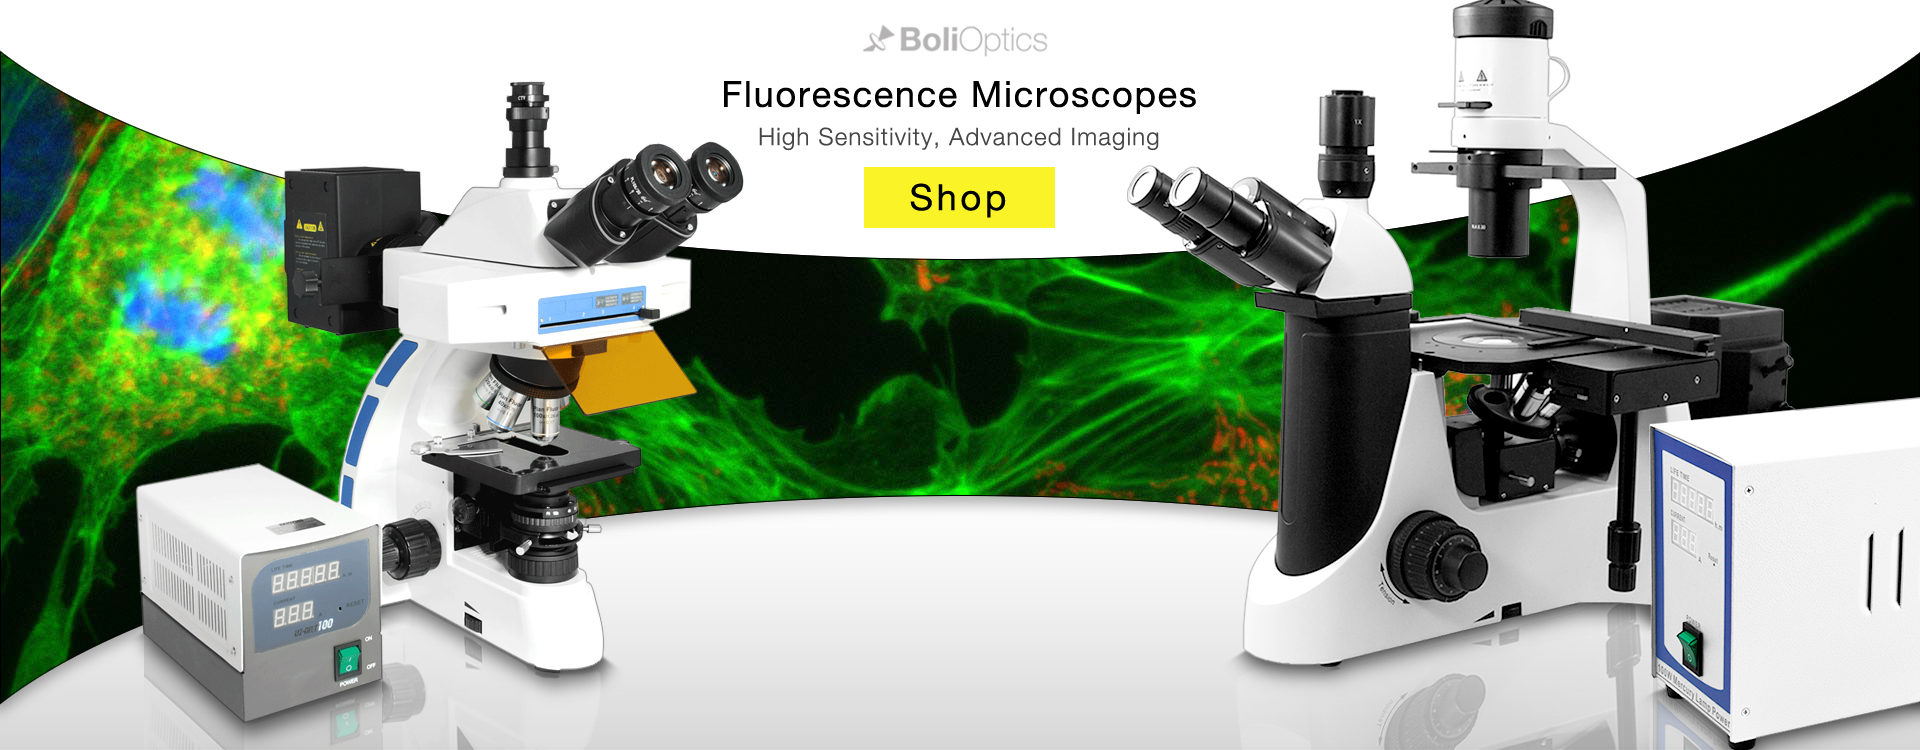 #1 Online Microscope and Accessory Store - Fluorescence Microscopes